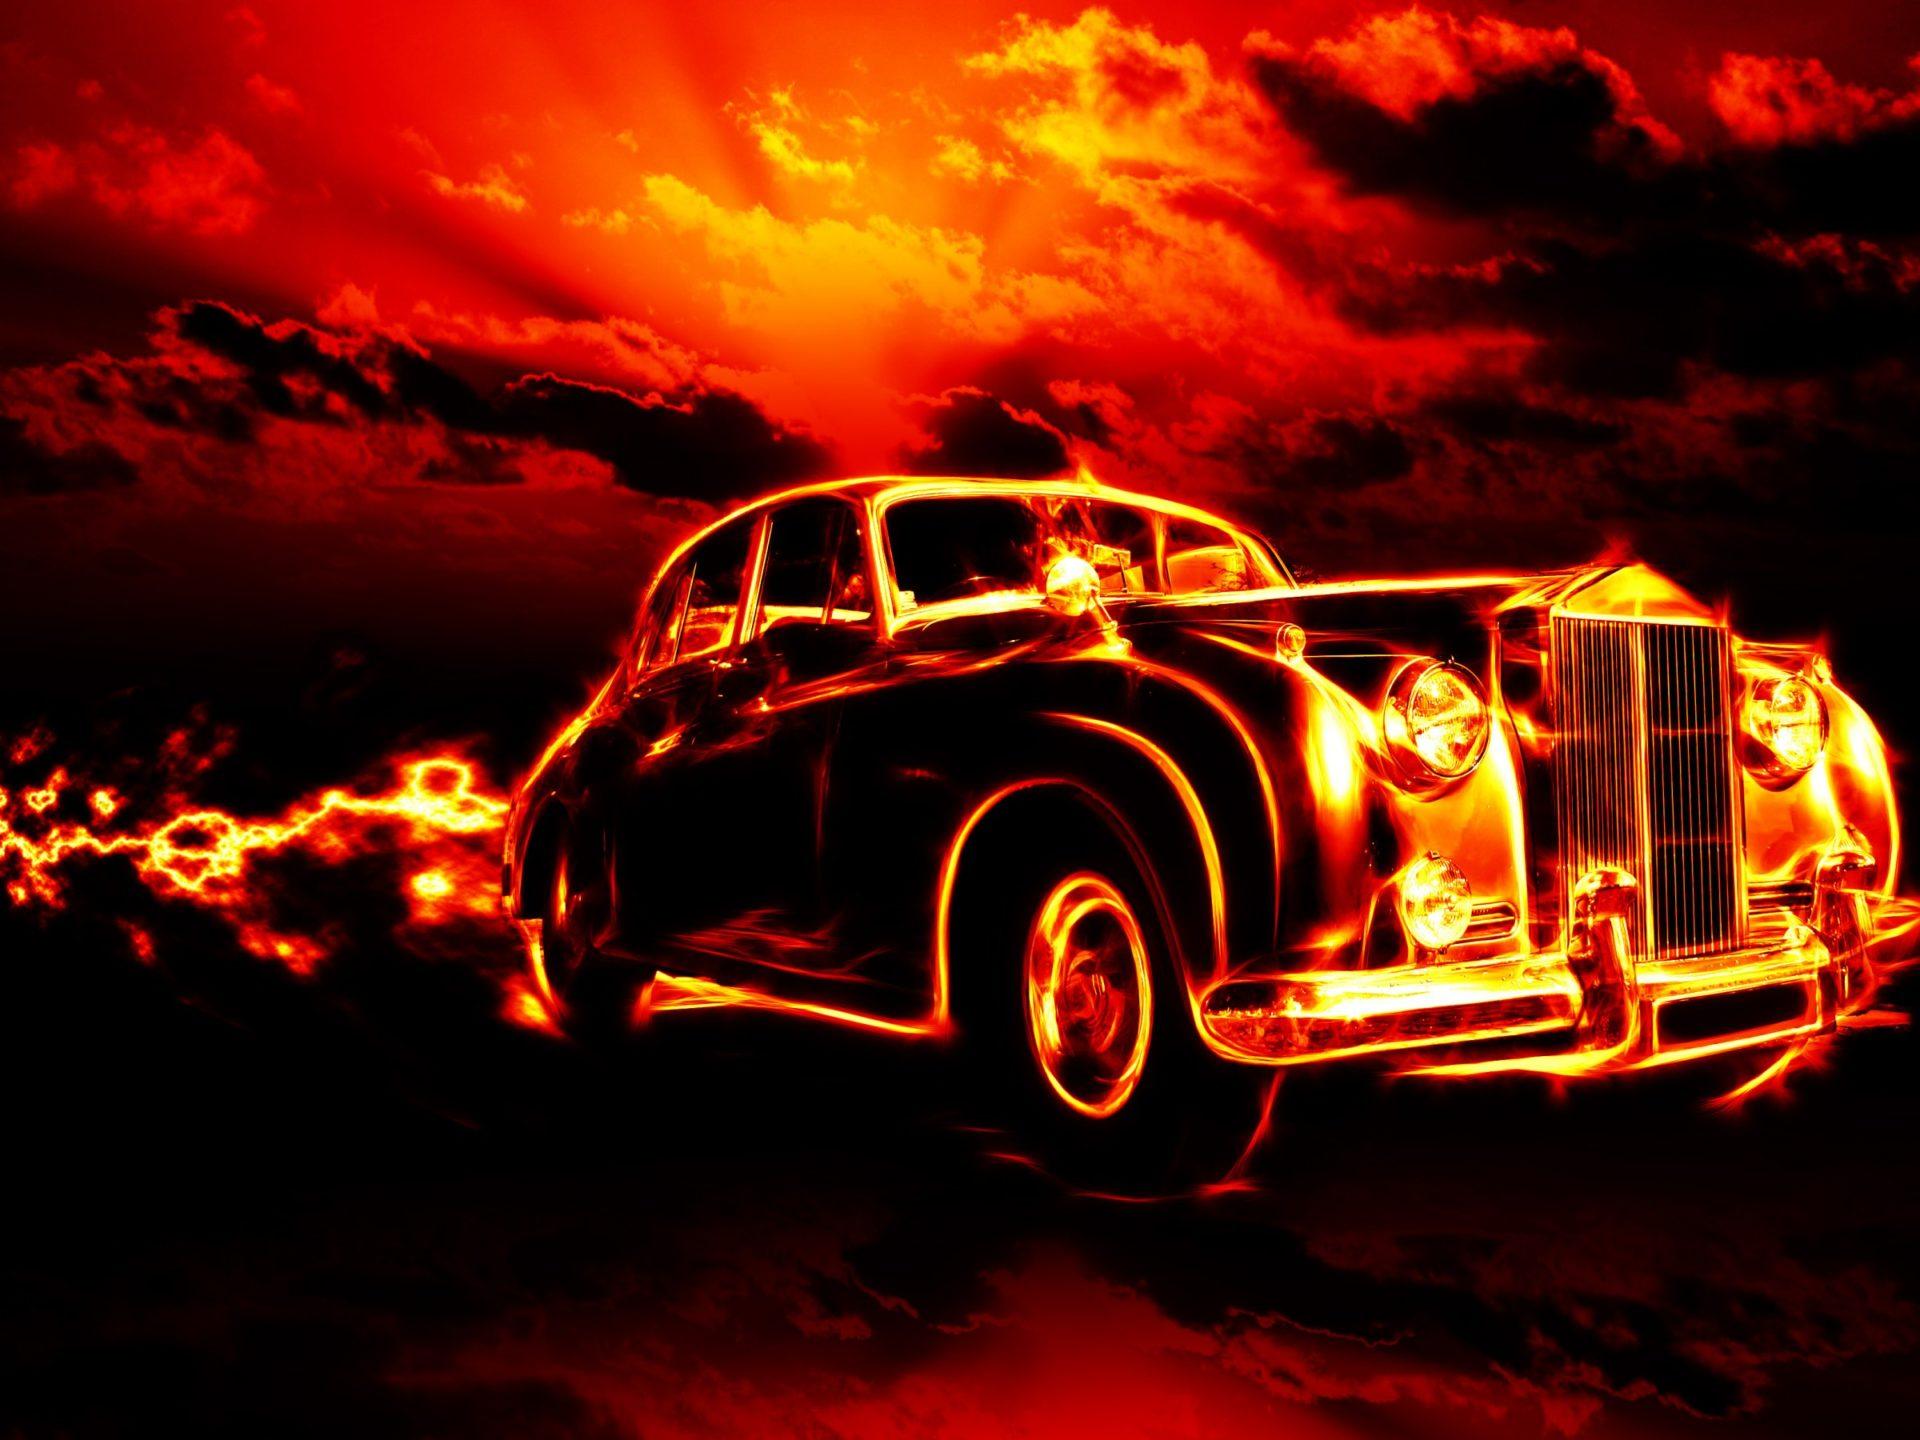 Iphone 5 Car Wallpaper Fire Classic Car Hd Wallpapers For Desktop 2880x1800